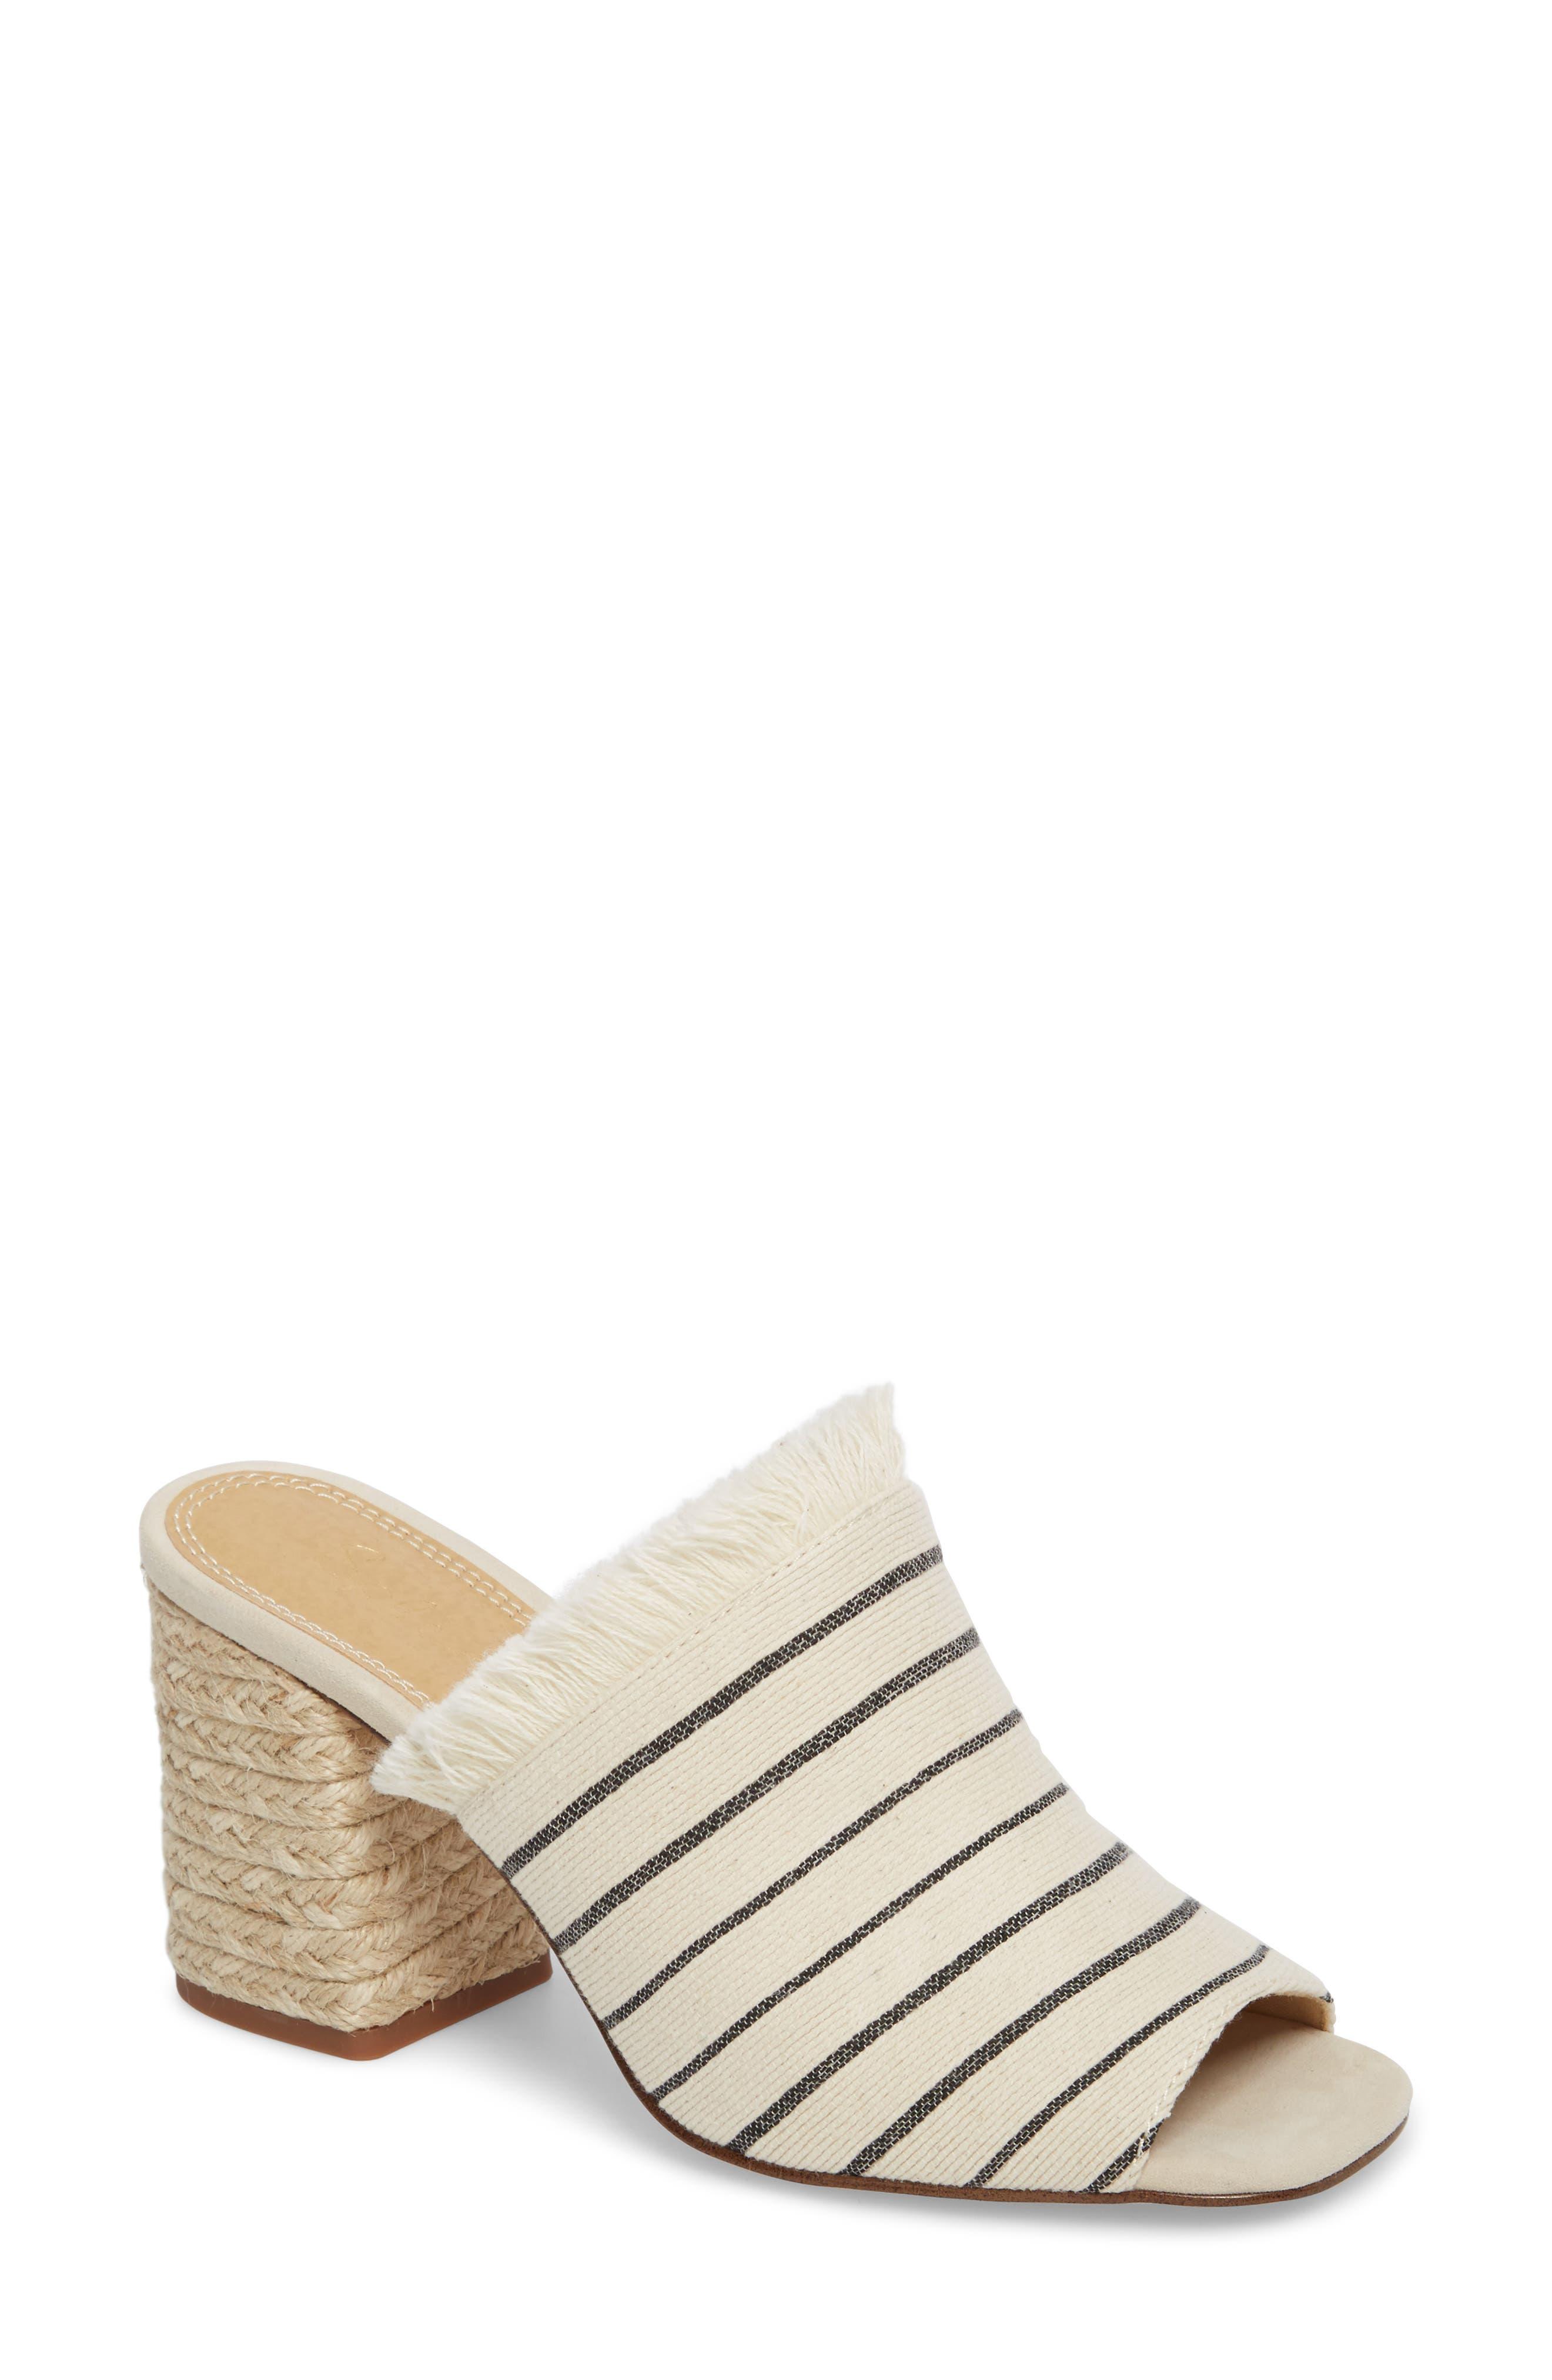 Baron Fringed Block Heel Slide,                         Main,                         color, Cream Leather